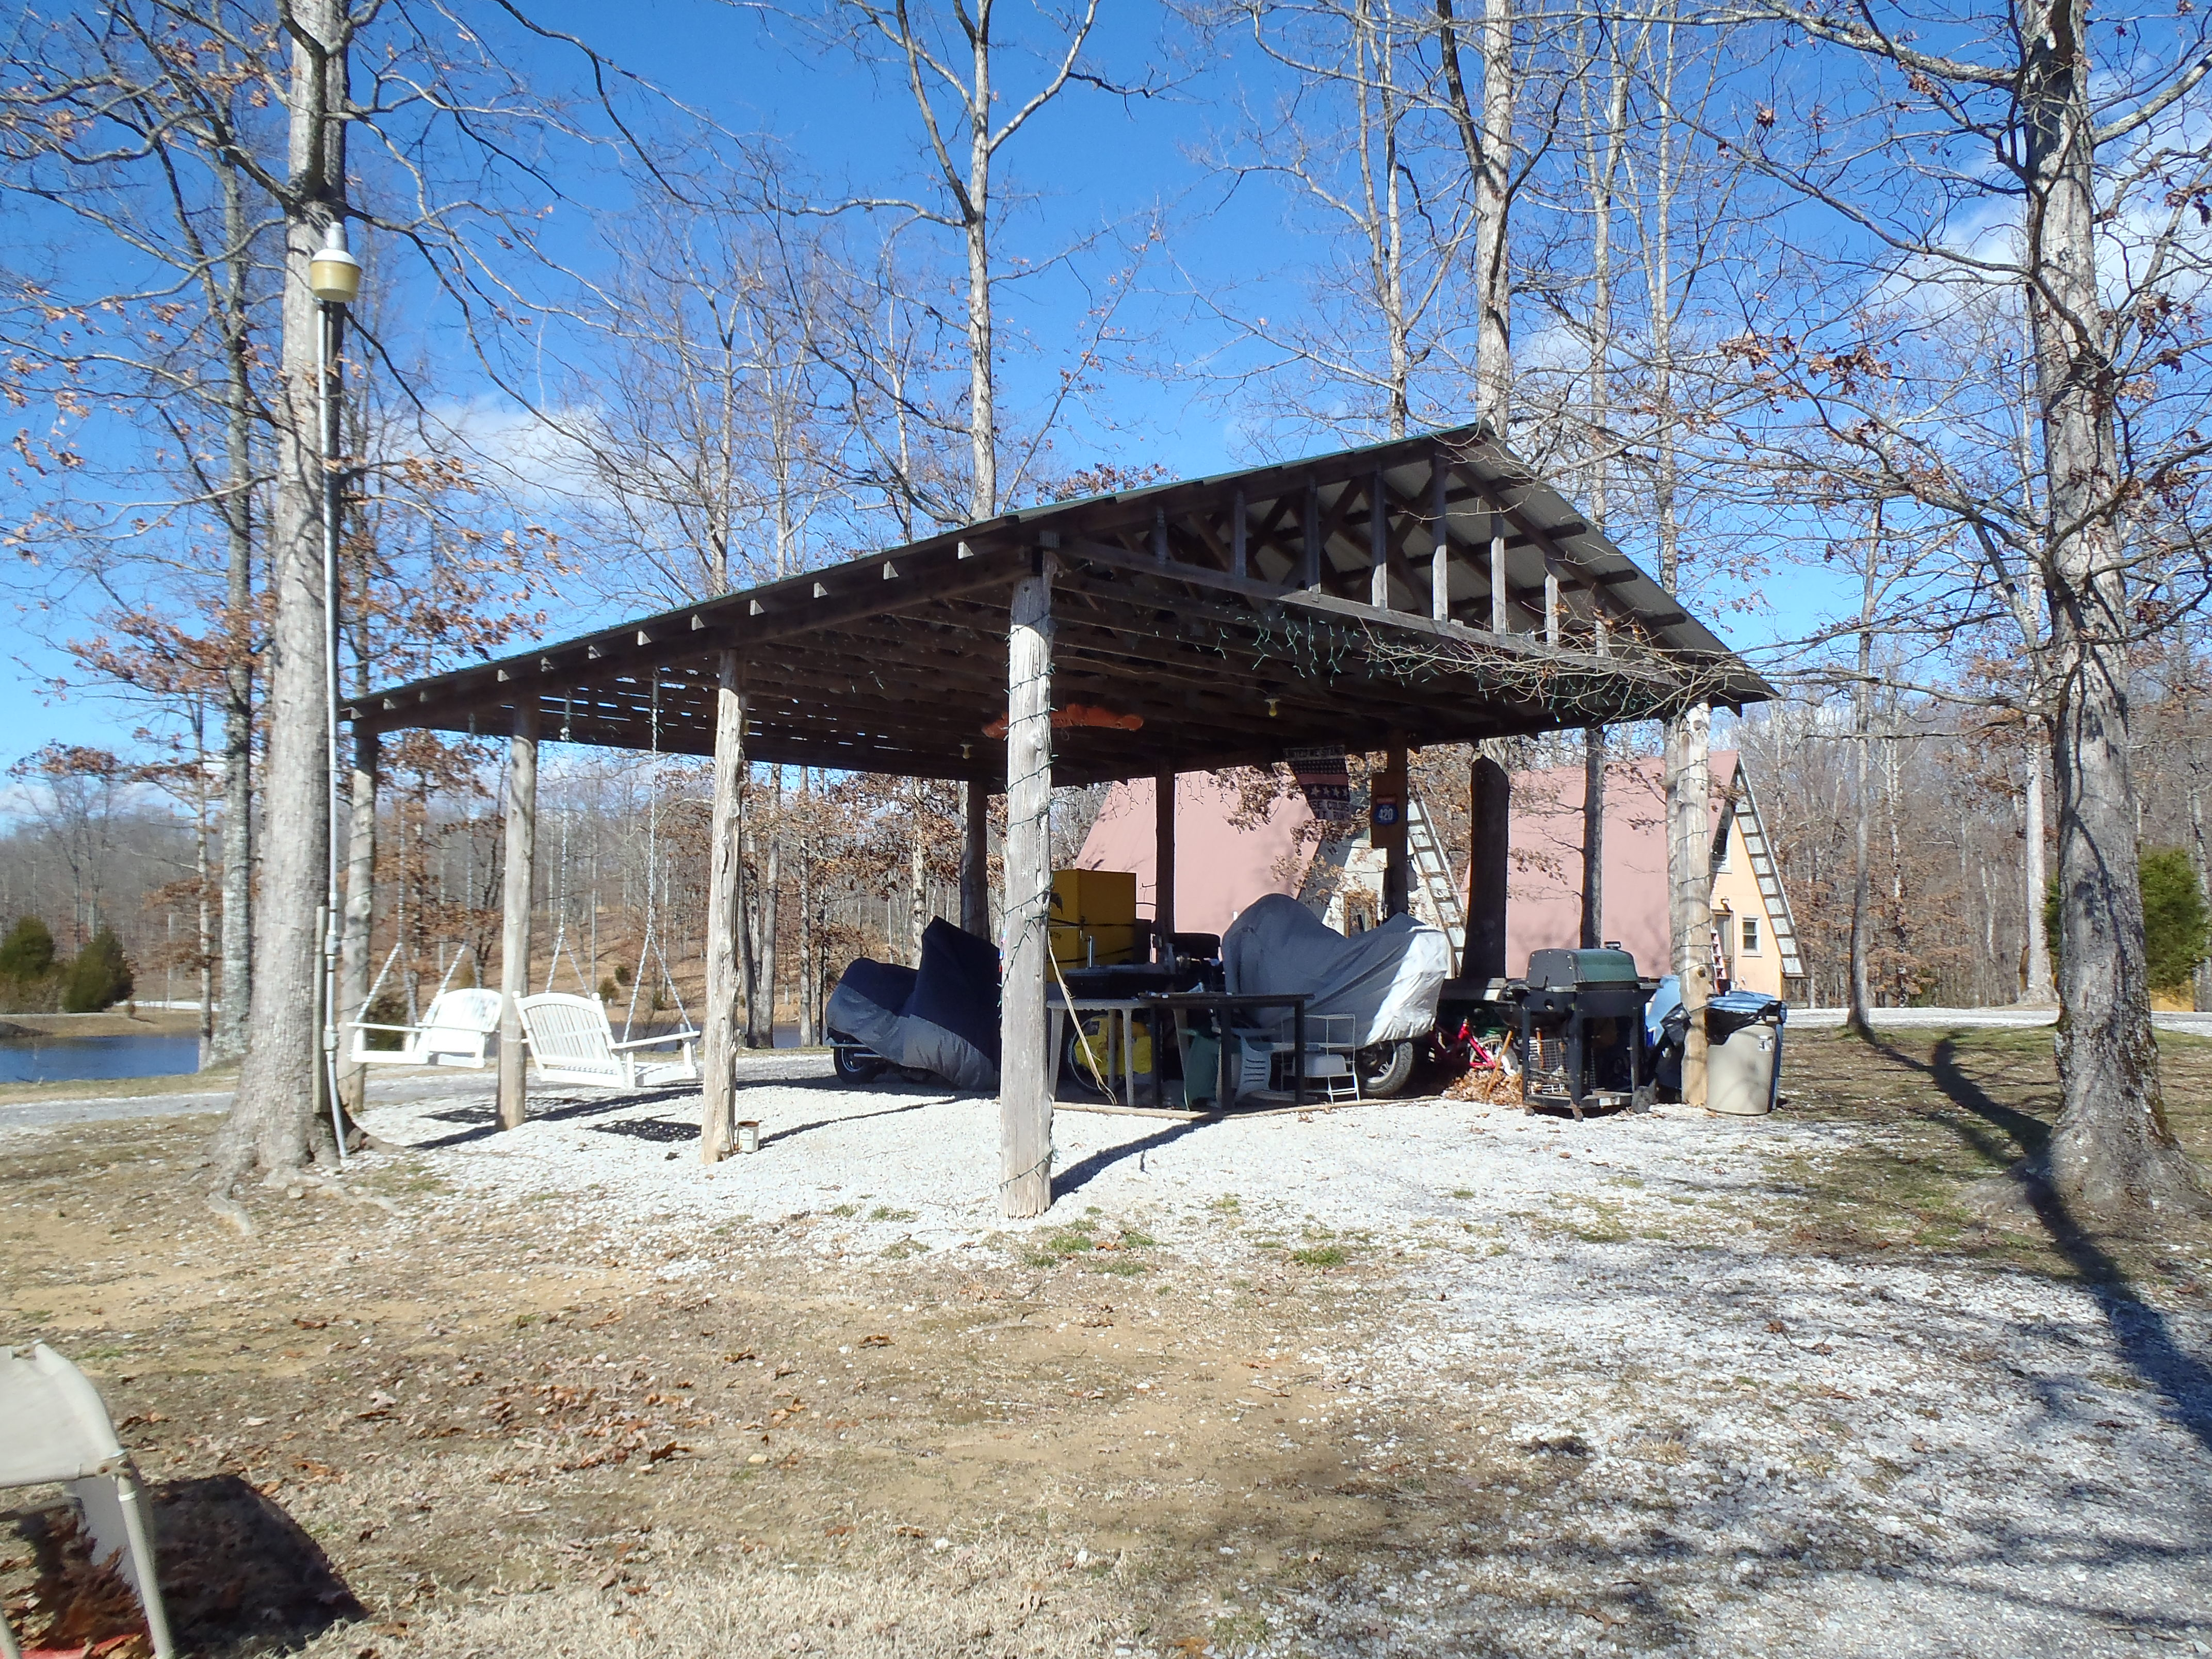 Party pavilion on a sunny day